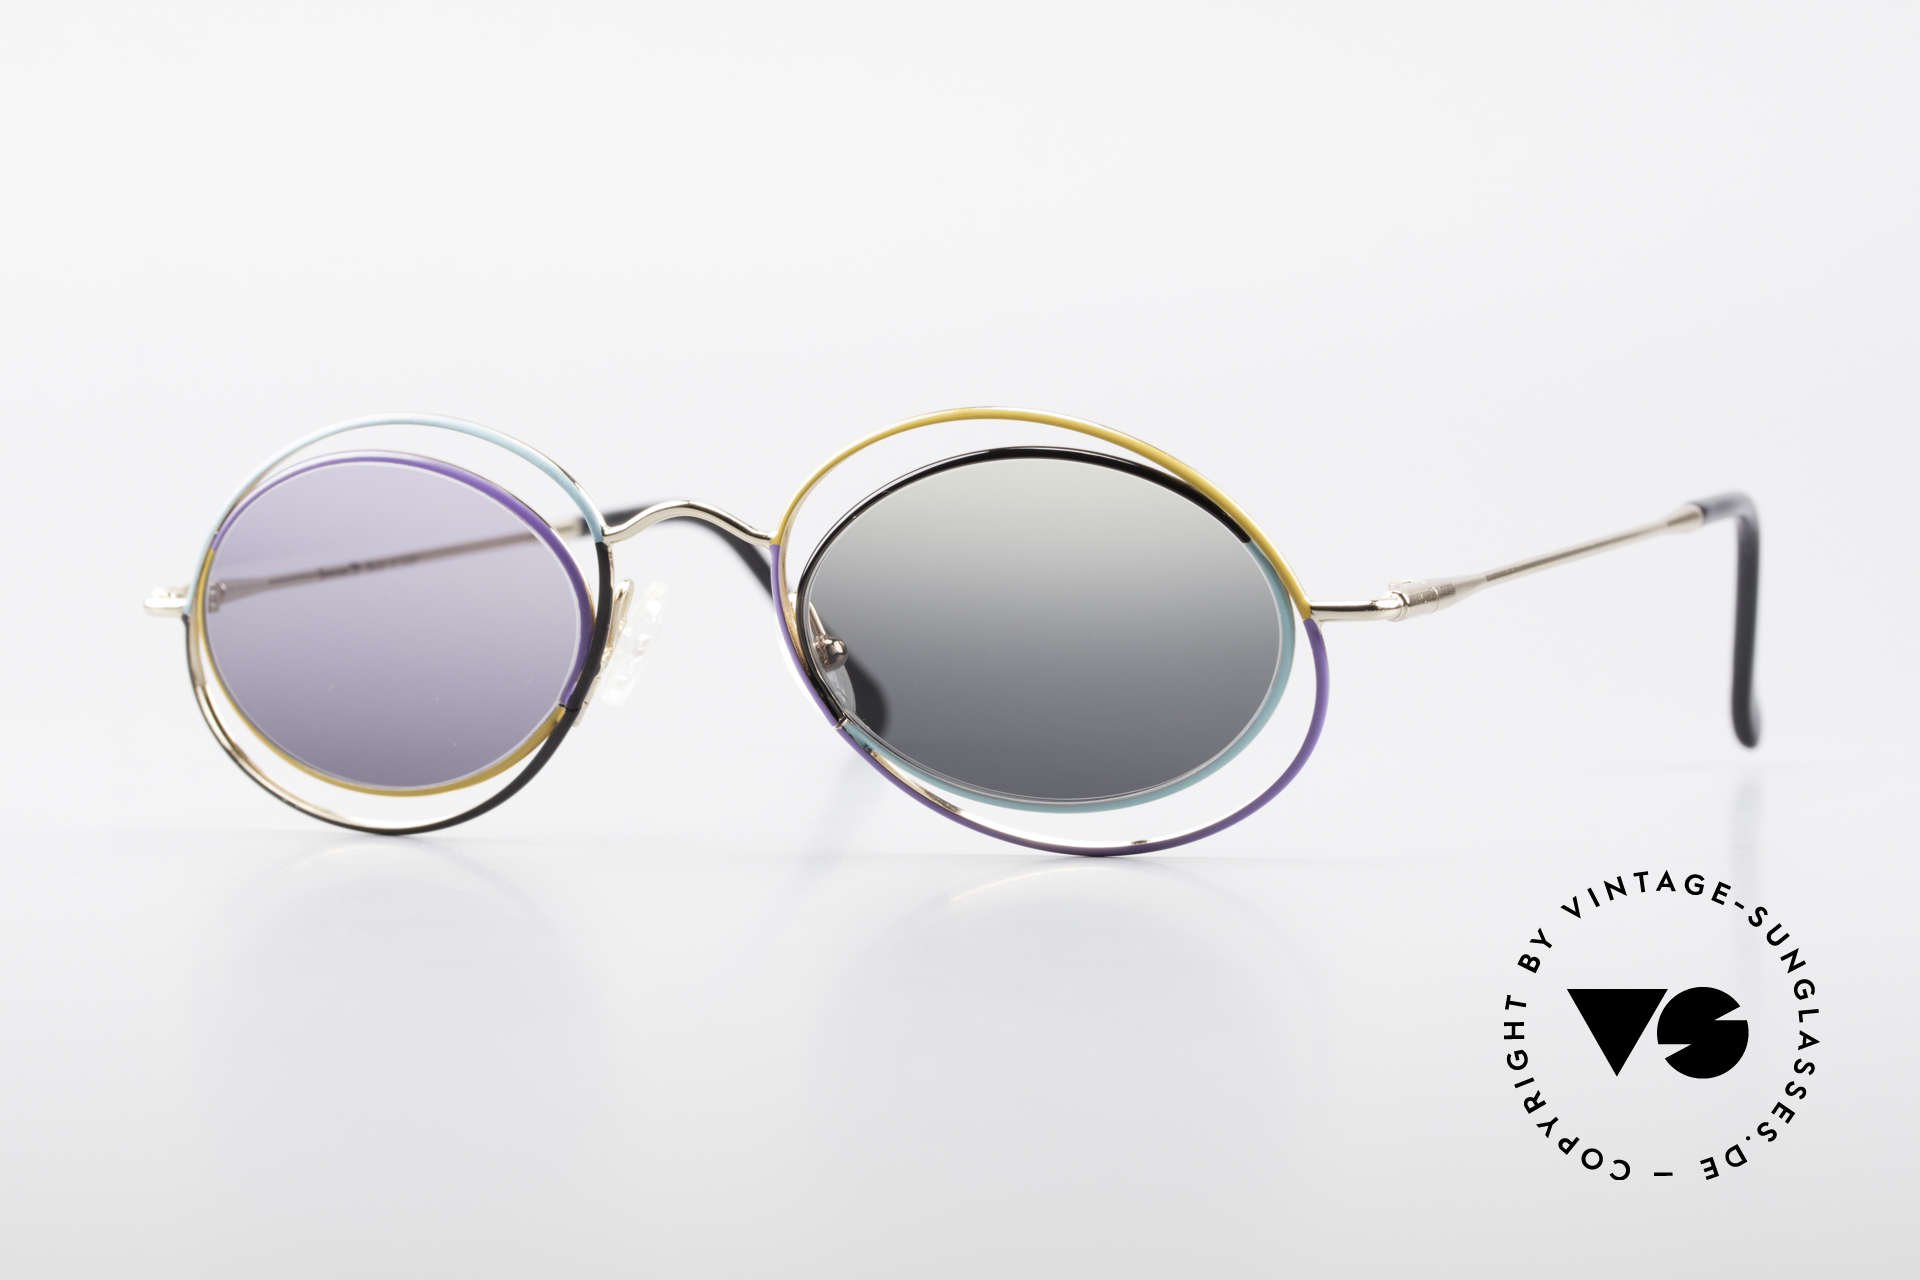 Casanova LC18 Vintage Art Sunglasses 80's, enchanting vintage 1980's CASANOVA sunglasses, Made for Women